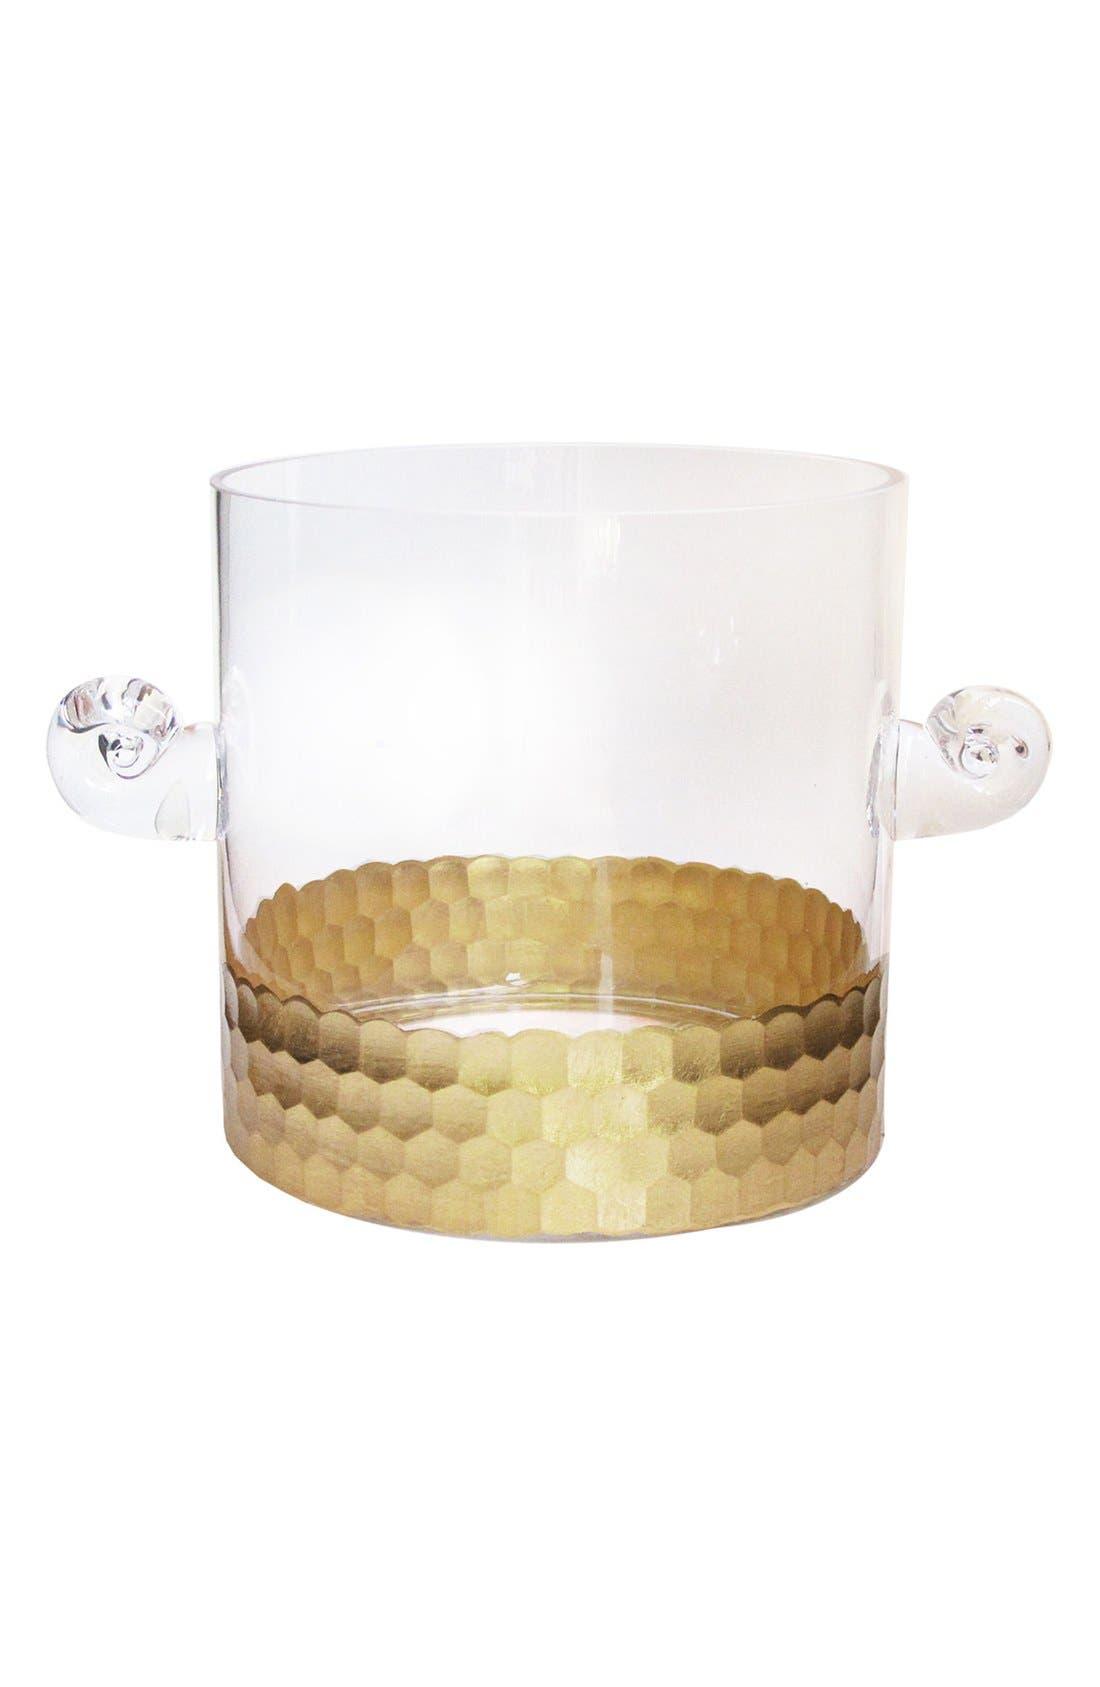 Main Image - American Atelier Daphne Ice Bucket